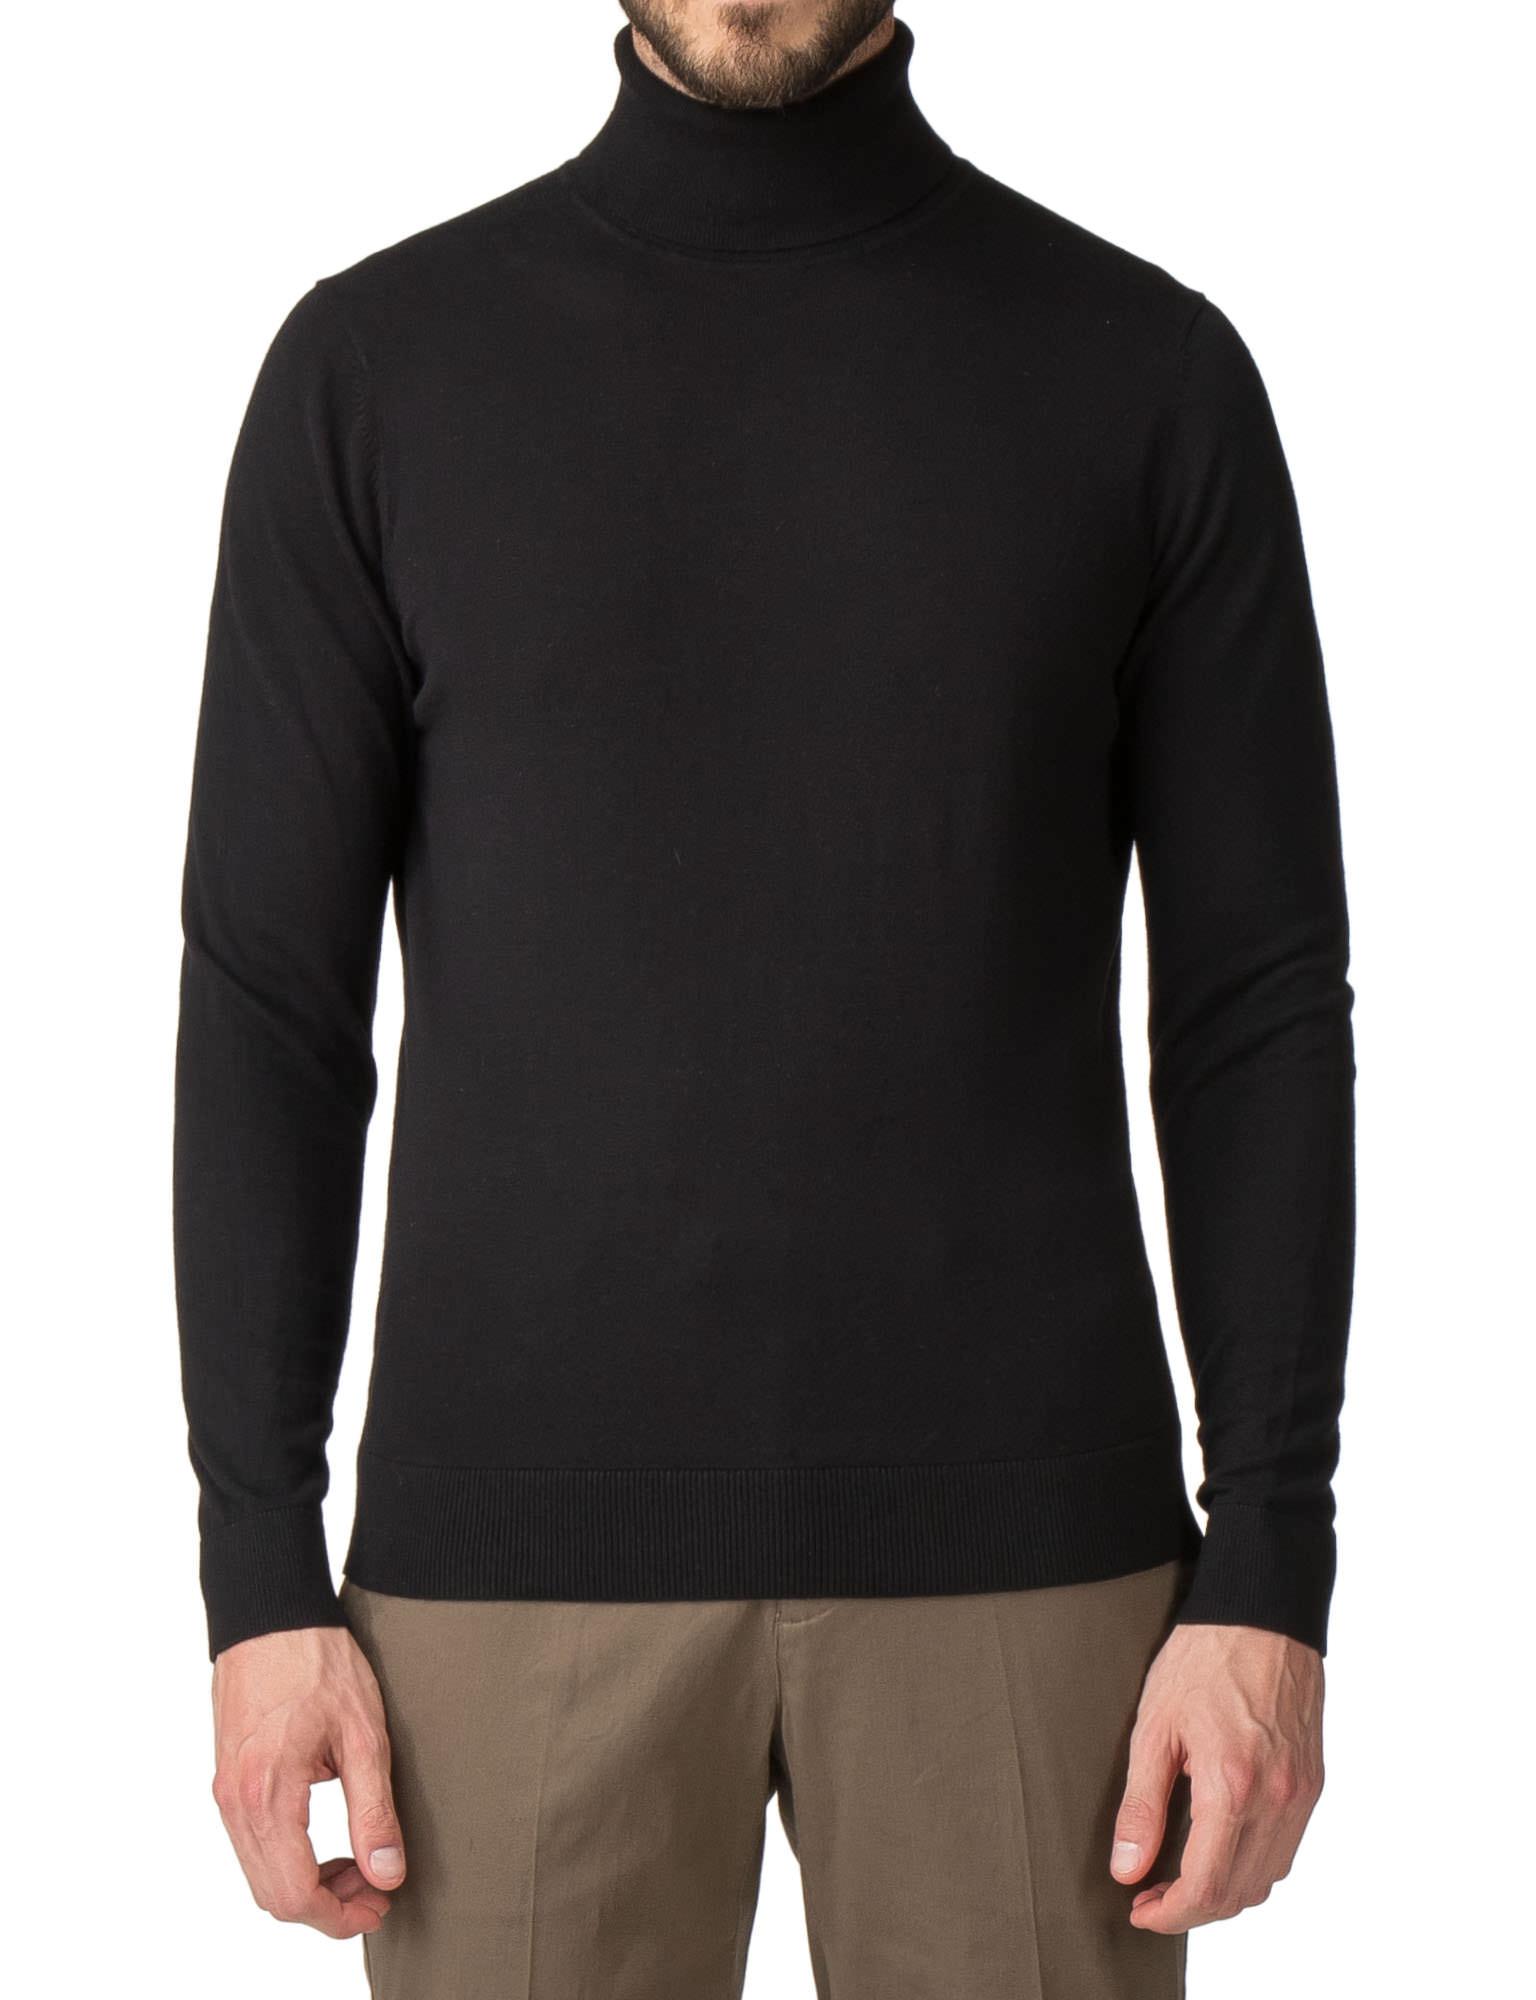 shop for newest suitable for men/women shop for genuine Jeff Banks BLACK COTTON ROLL NECK JUMPER- currently ...